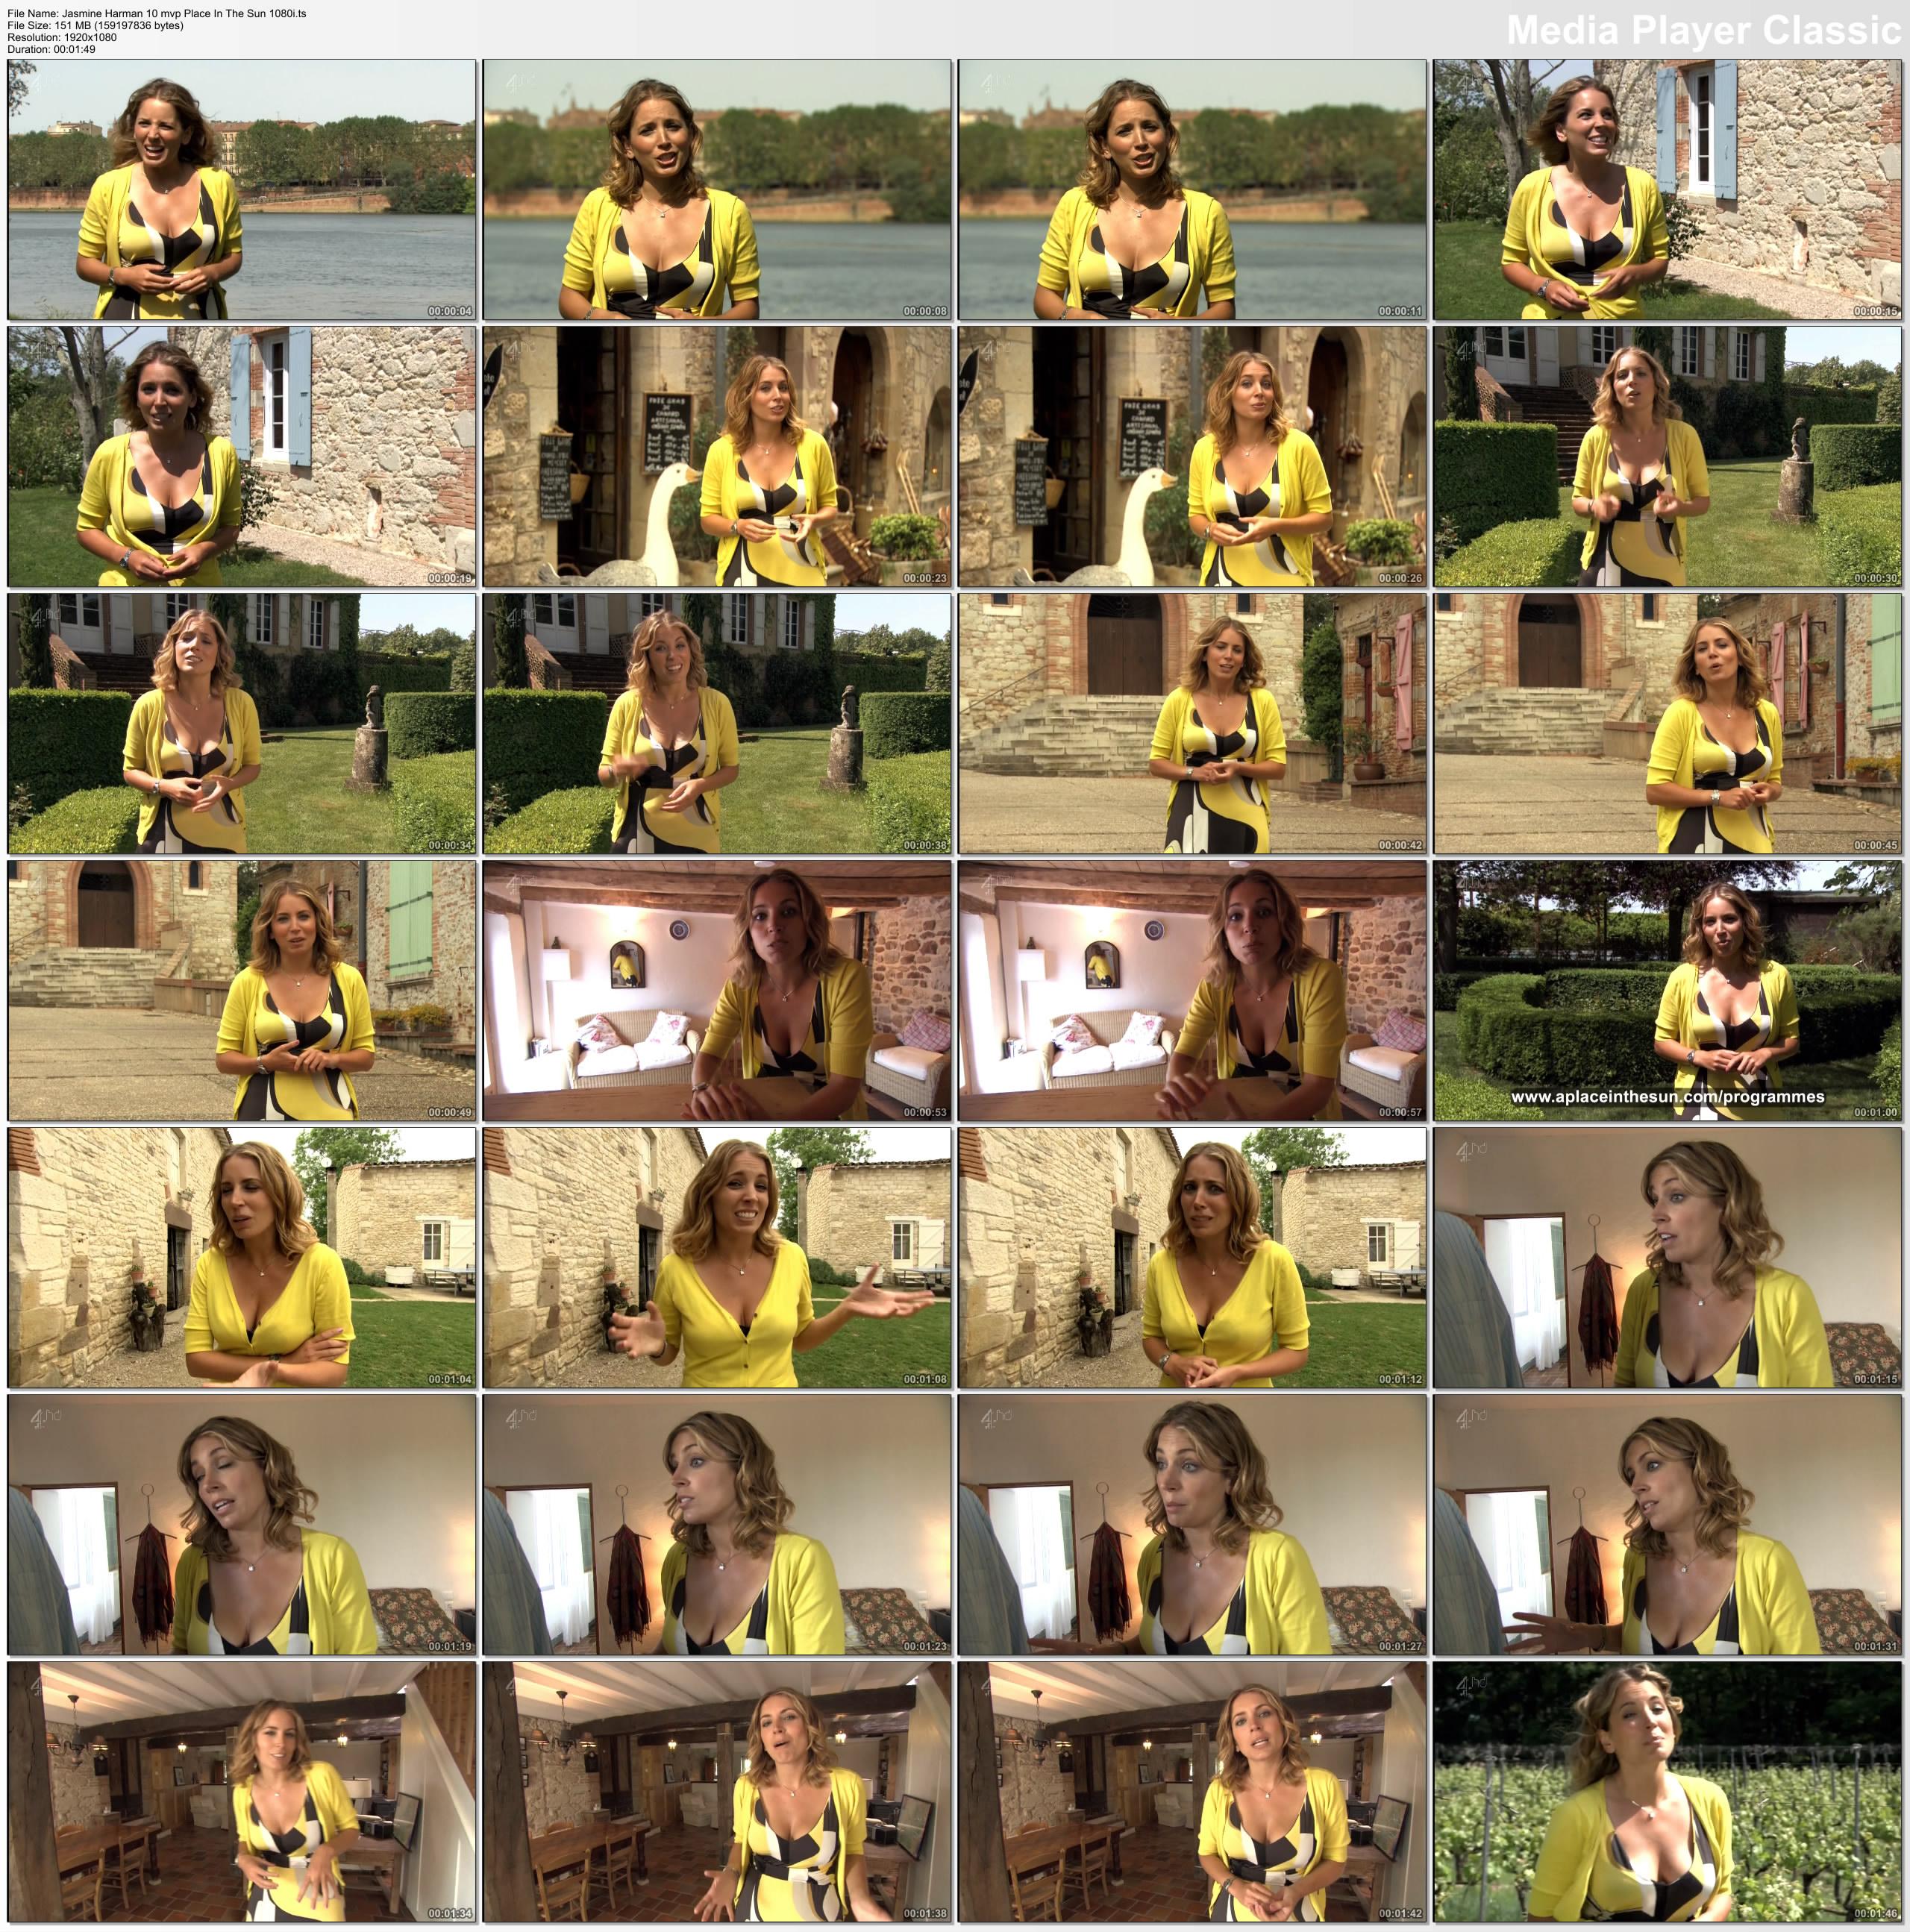 Jasmine Harman 10 mvp Place In The Sun 1080i.ts_thumbs.jpg